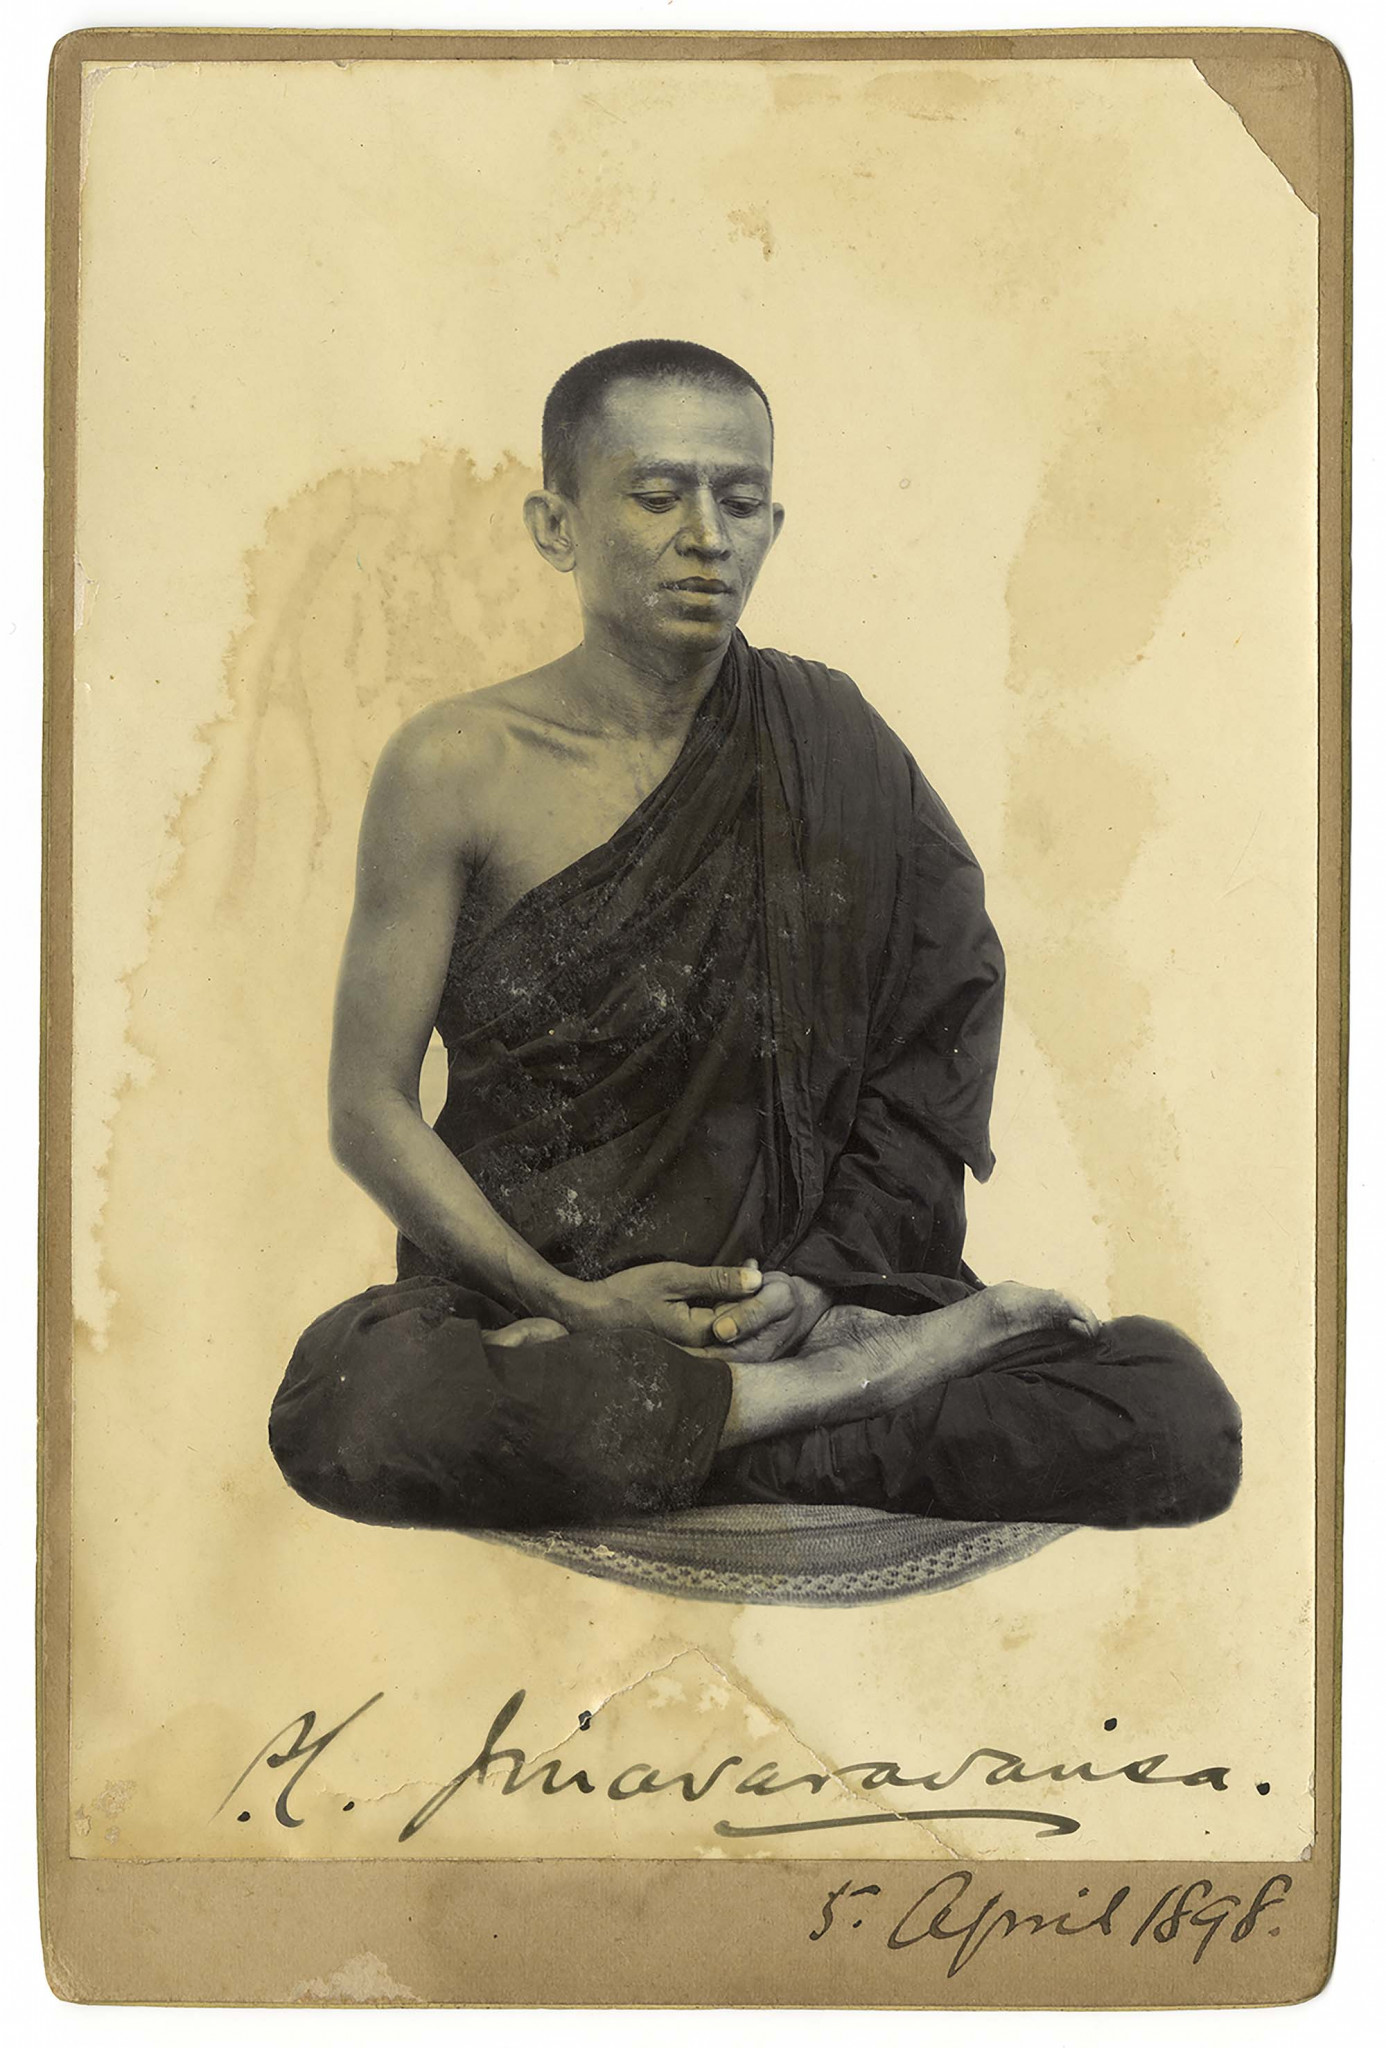 J. C. Jinaravansa (1851–1935)